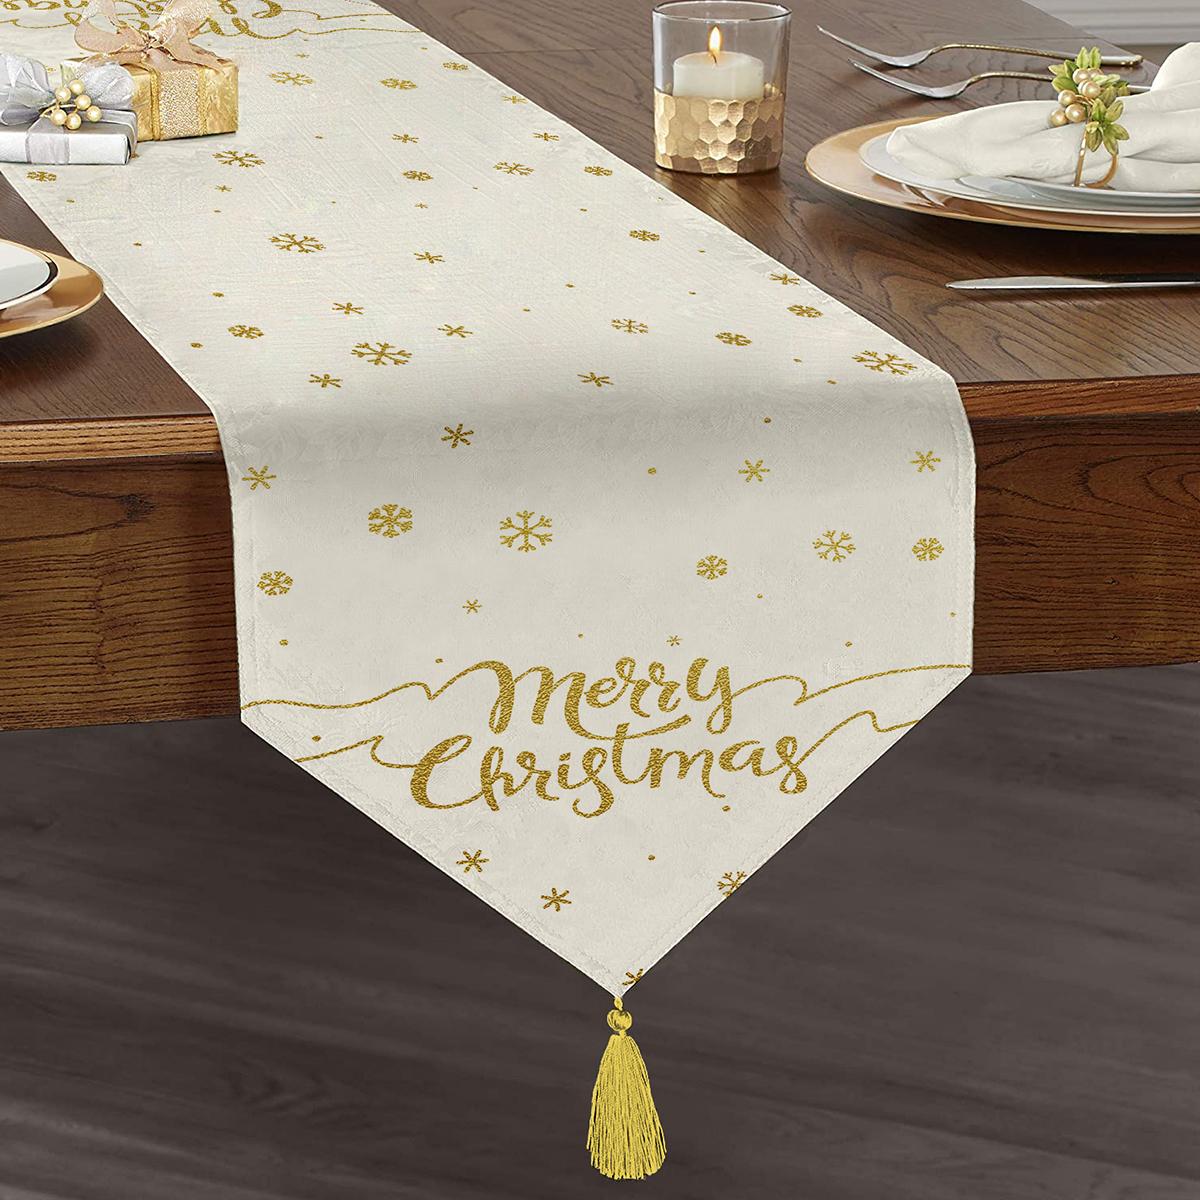 Realhomes Beyaz Zeminli Gold Detaylı Kartaneli Merry Christmas Yazılı Özel Tasarım Püsküllü Şönil Üçgen Runner Realhomes